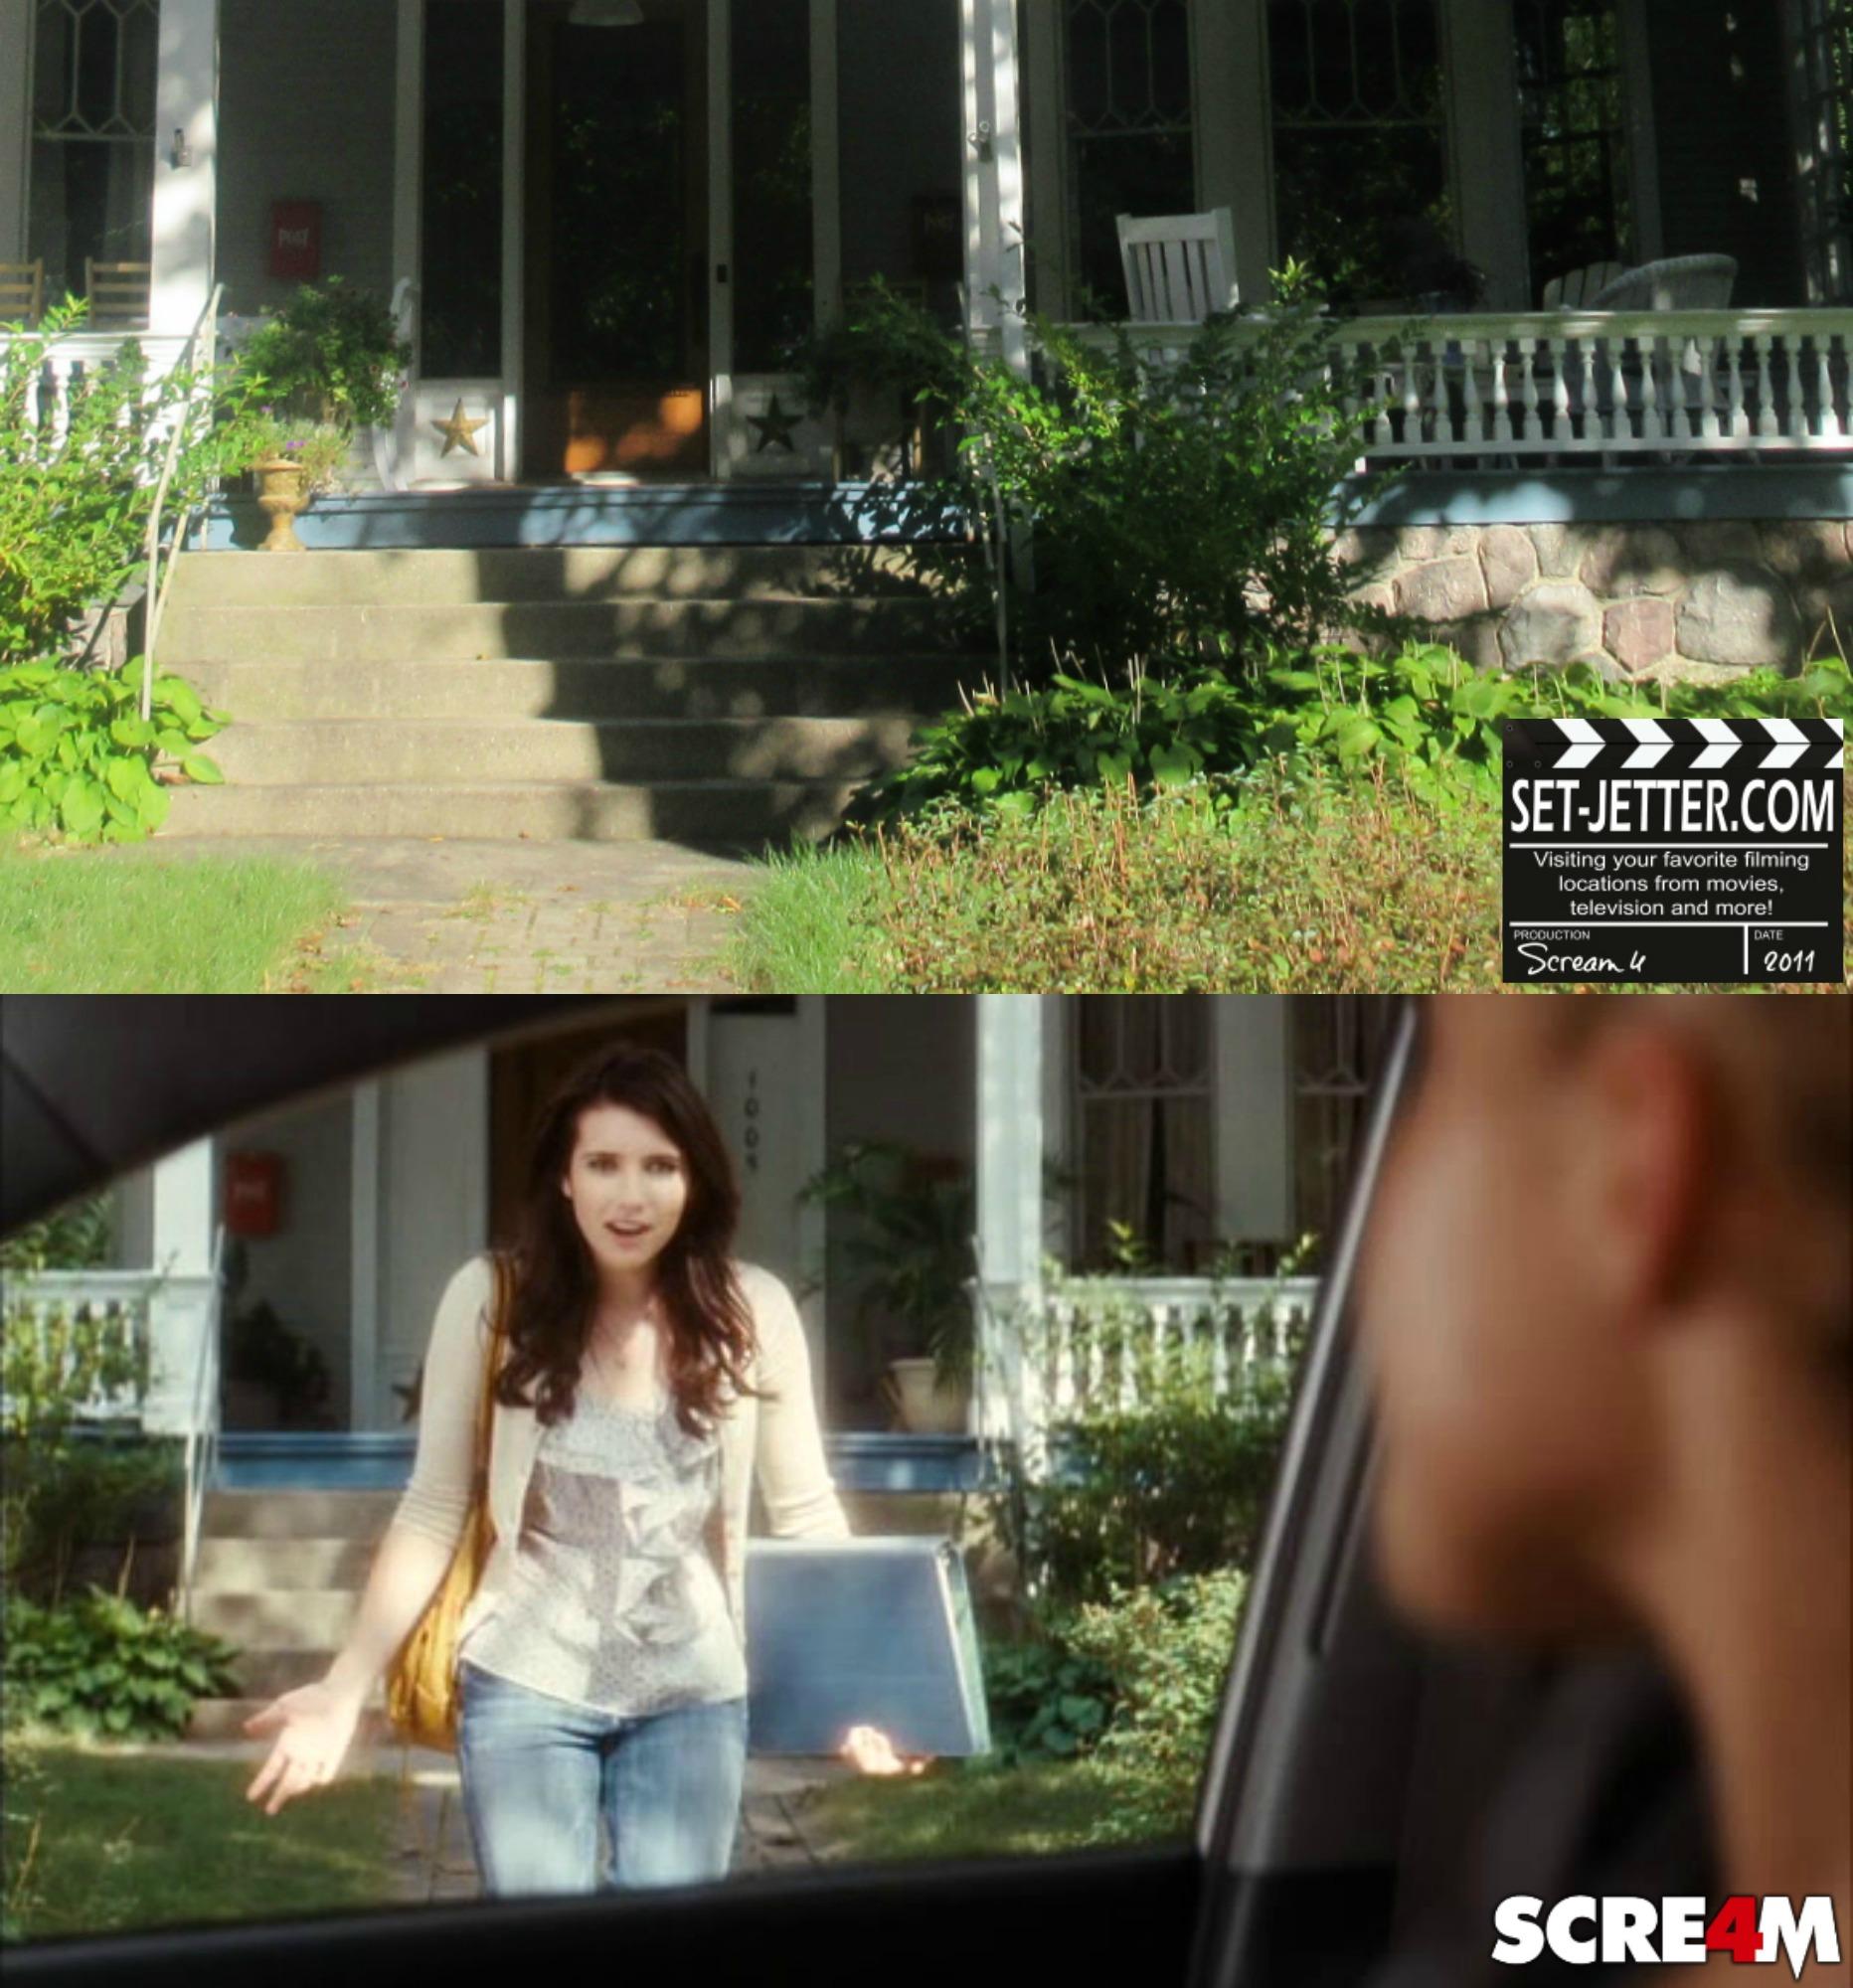 Scream4 comparison 35.jpg